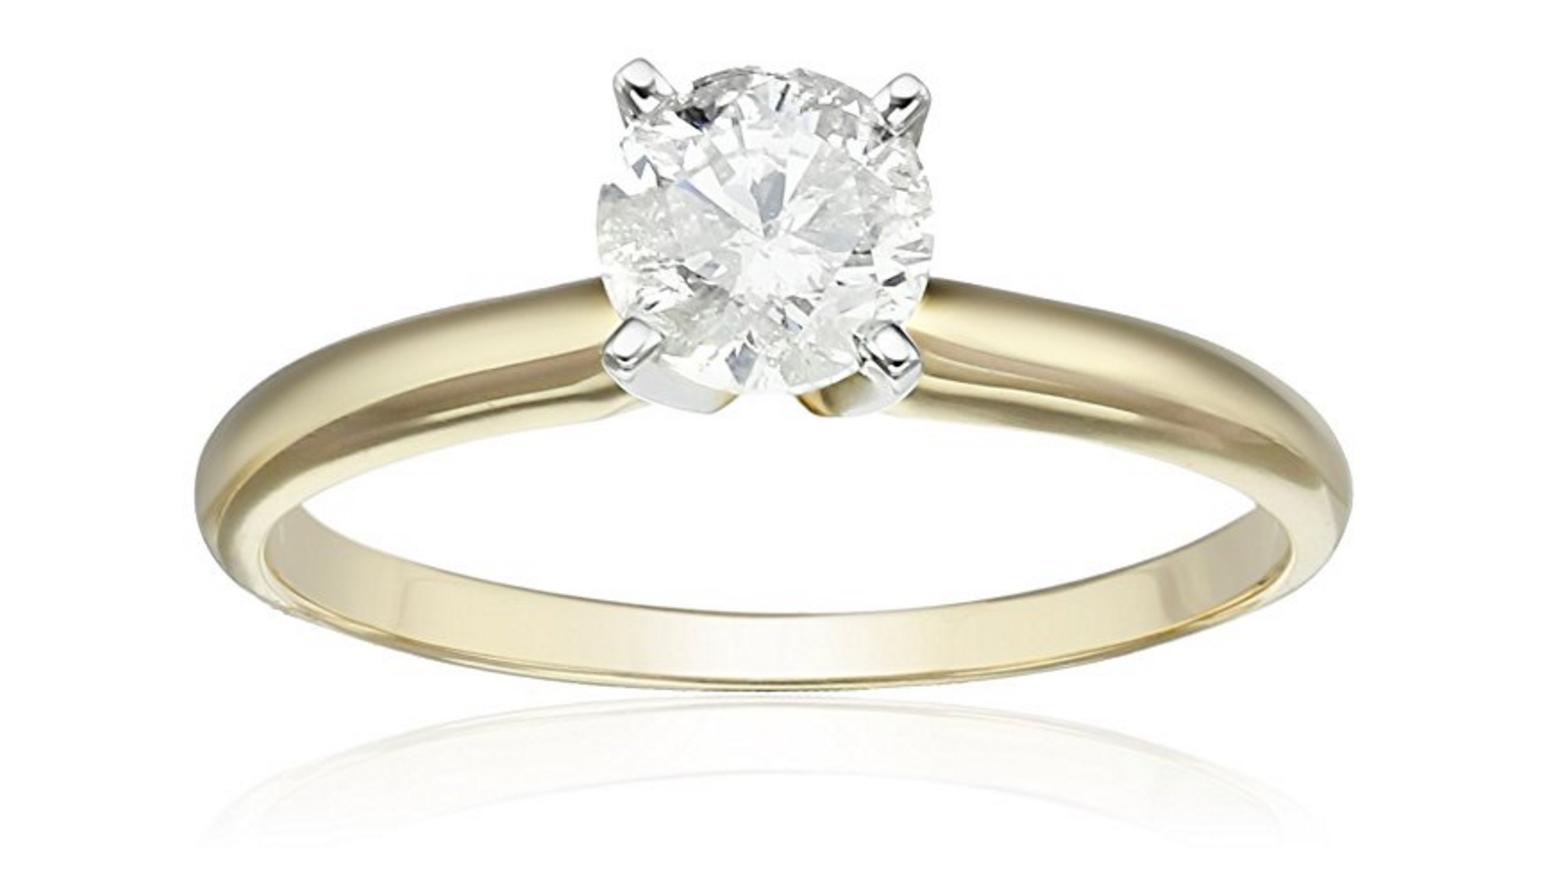 Amazon, cyber monday, cyber monday sales, cyber monday deals, diamond, diamond solitaire, diamond engagement rings, diamond rings